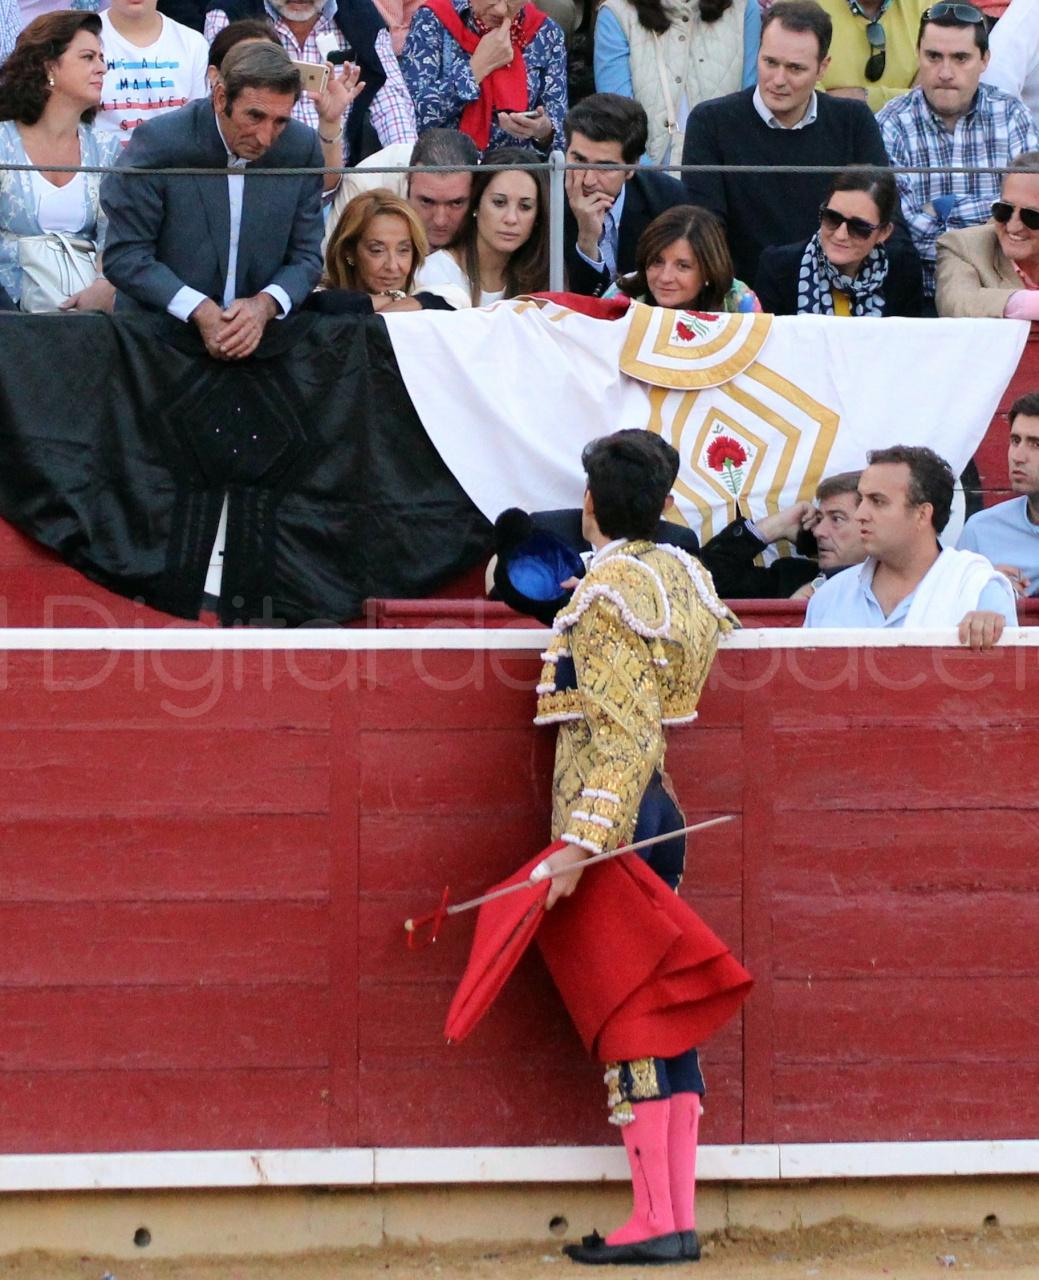 El Juli Lopez Simon y Garrido Feria Albacete 2015 toros  117